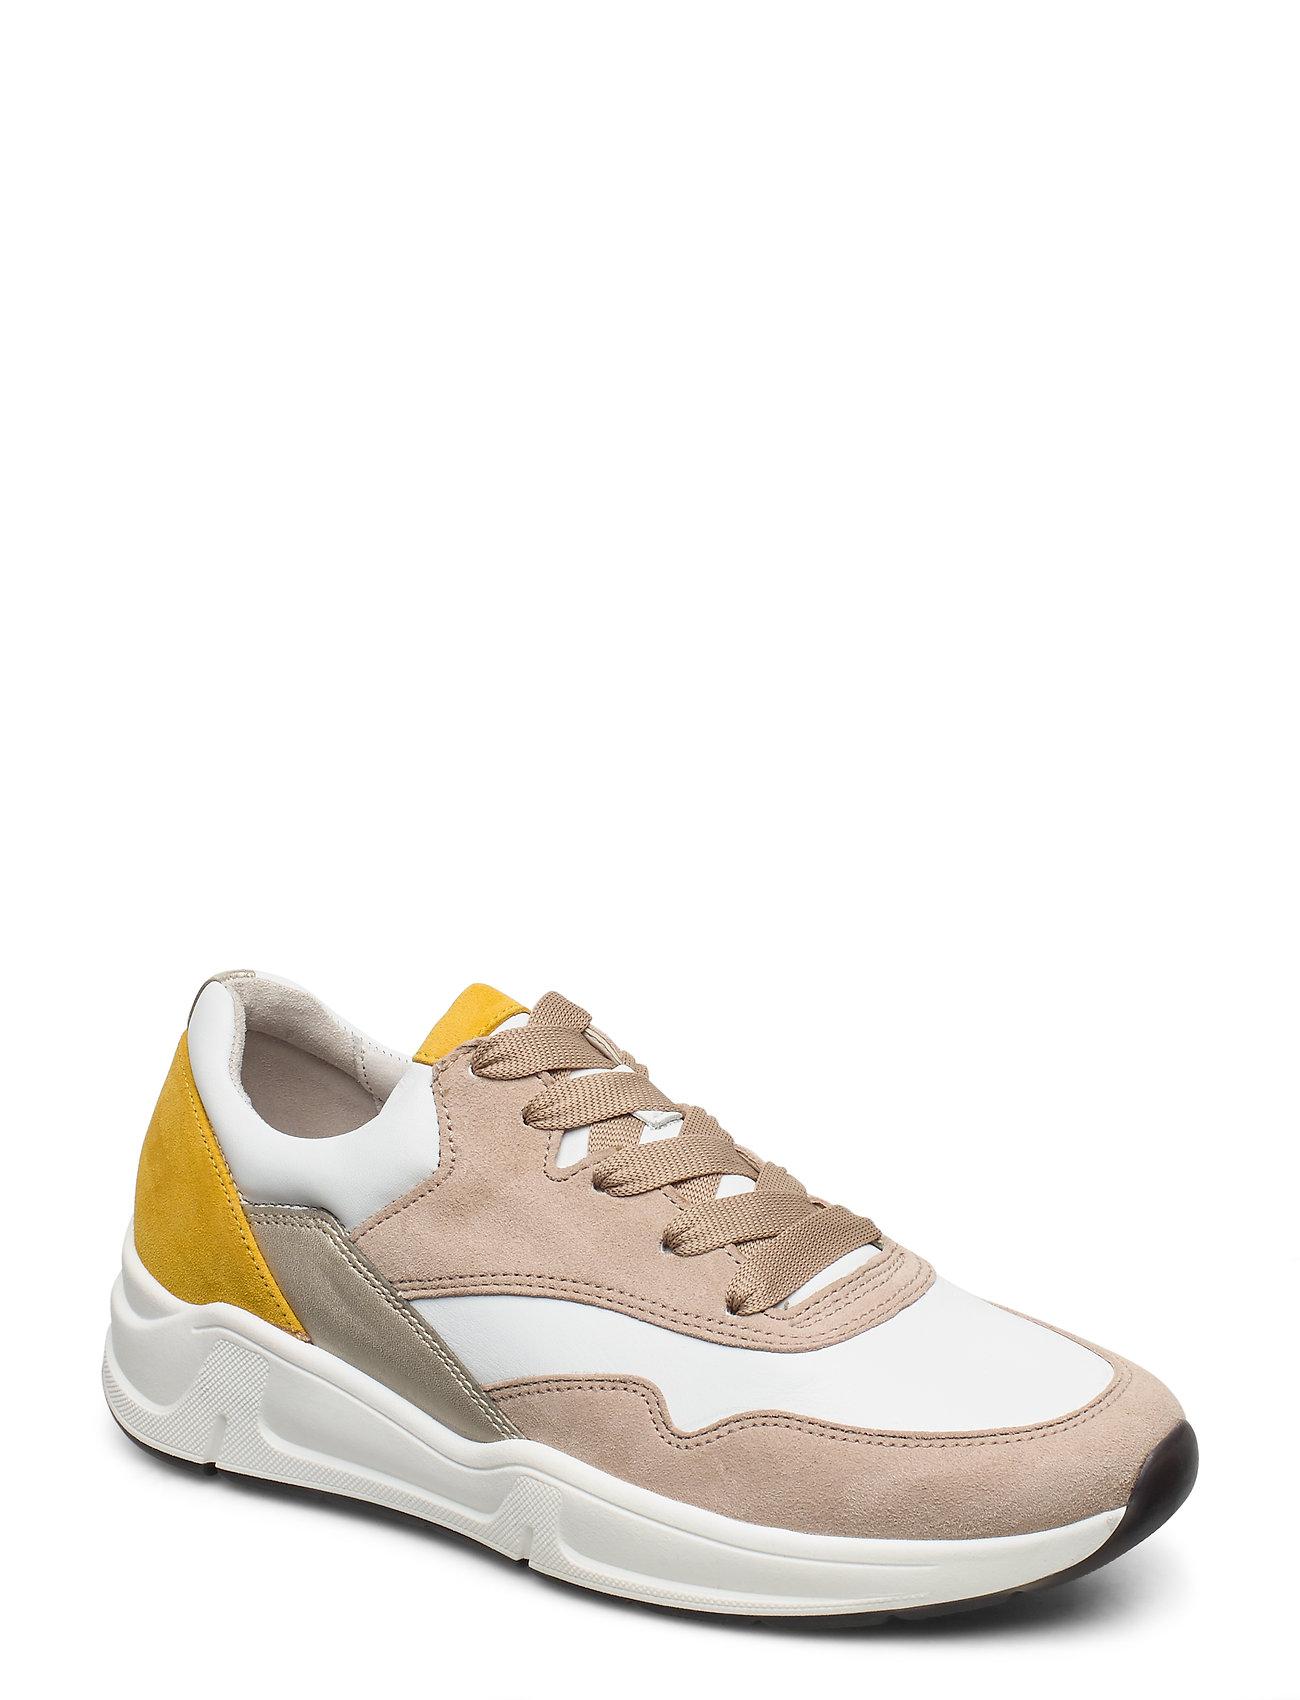 Image of Sneaker Low-top Sneakers Beige Gabor (3370075511)